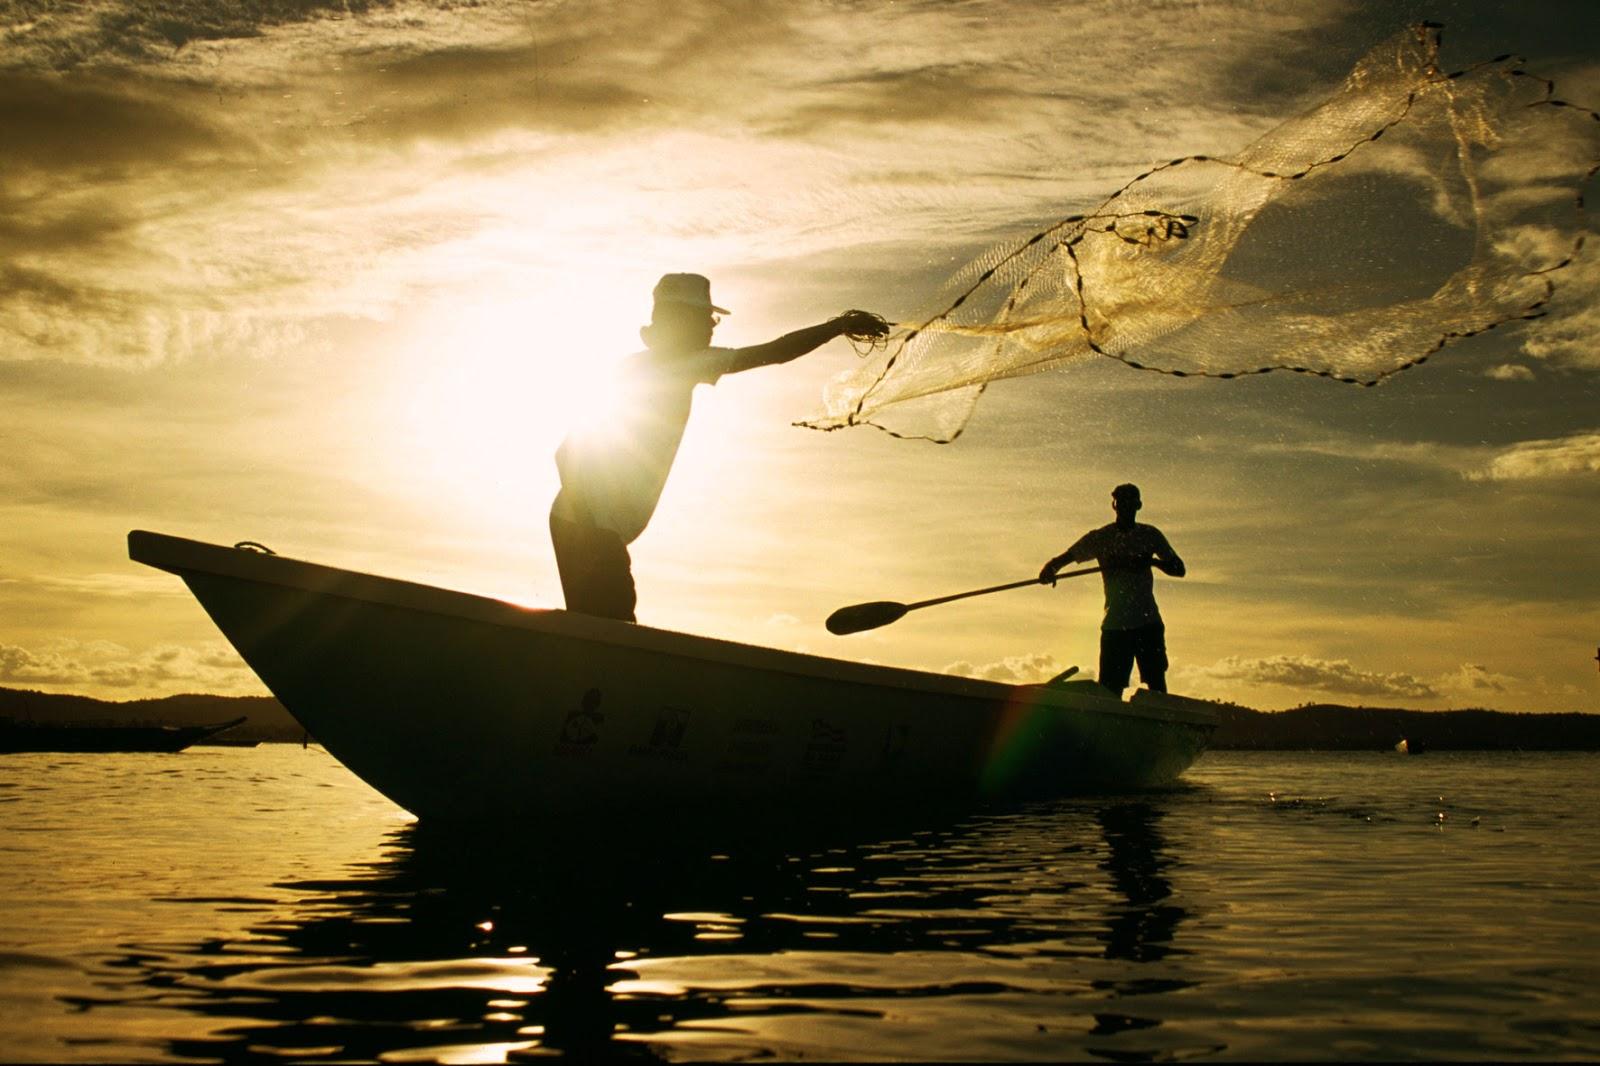 O desafio de ser pescador artesanal no Brasil